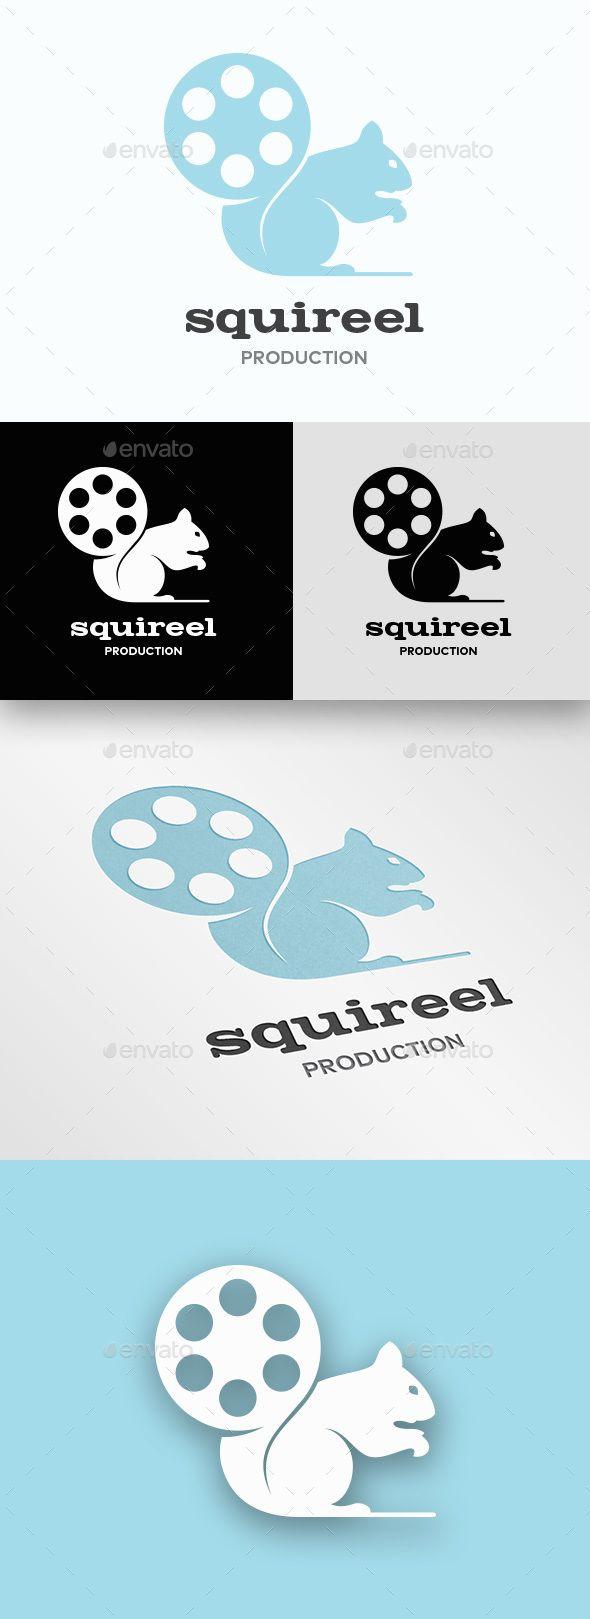 59 best film logos images on Pinterest | Logo ideas, Film logo and ...